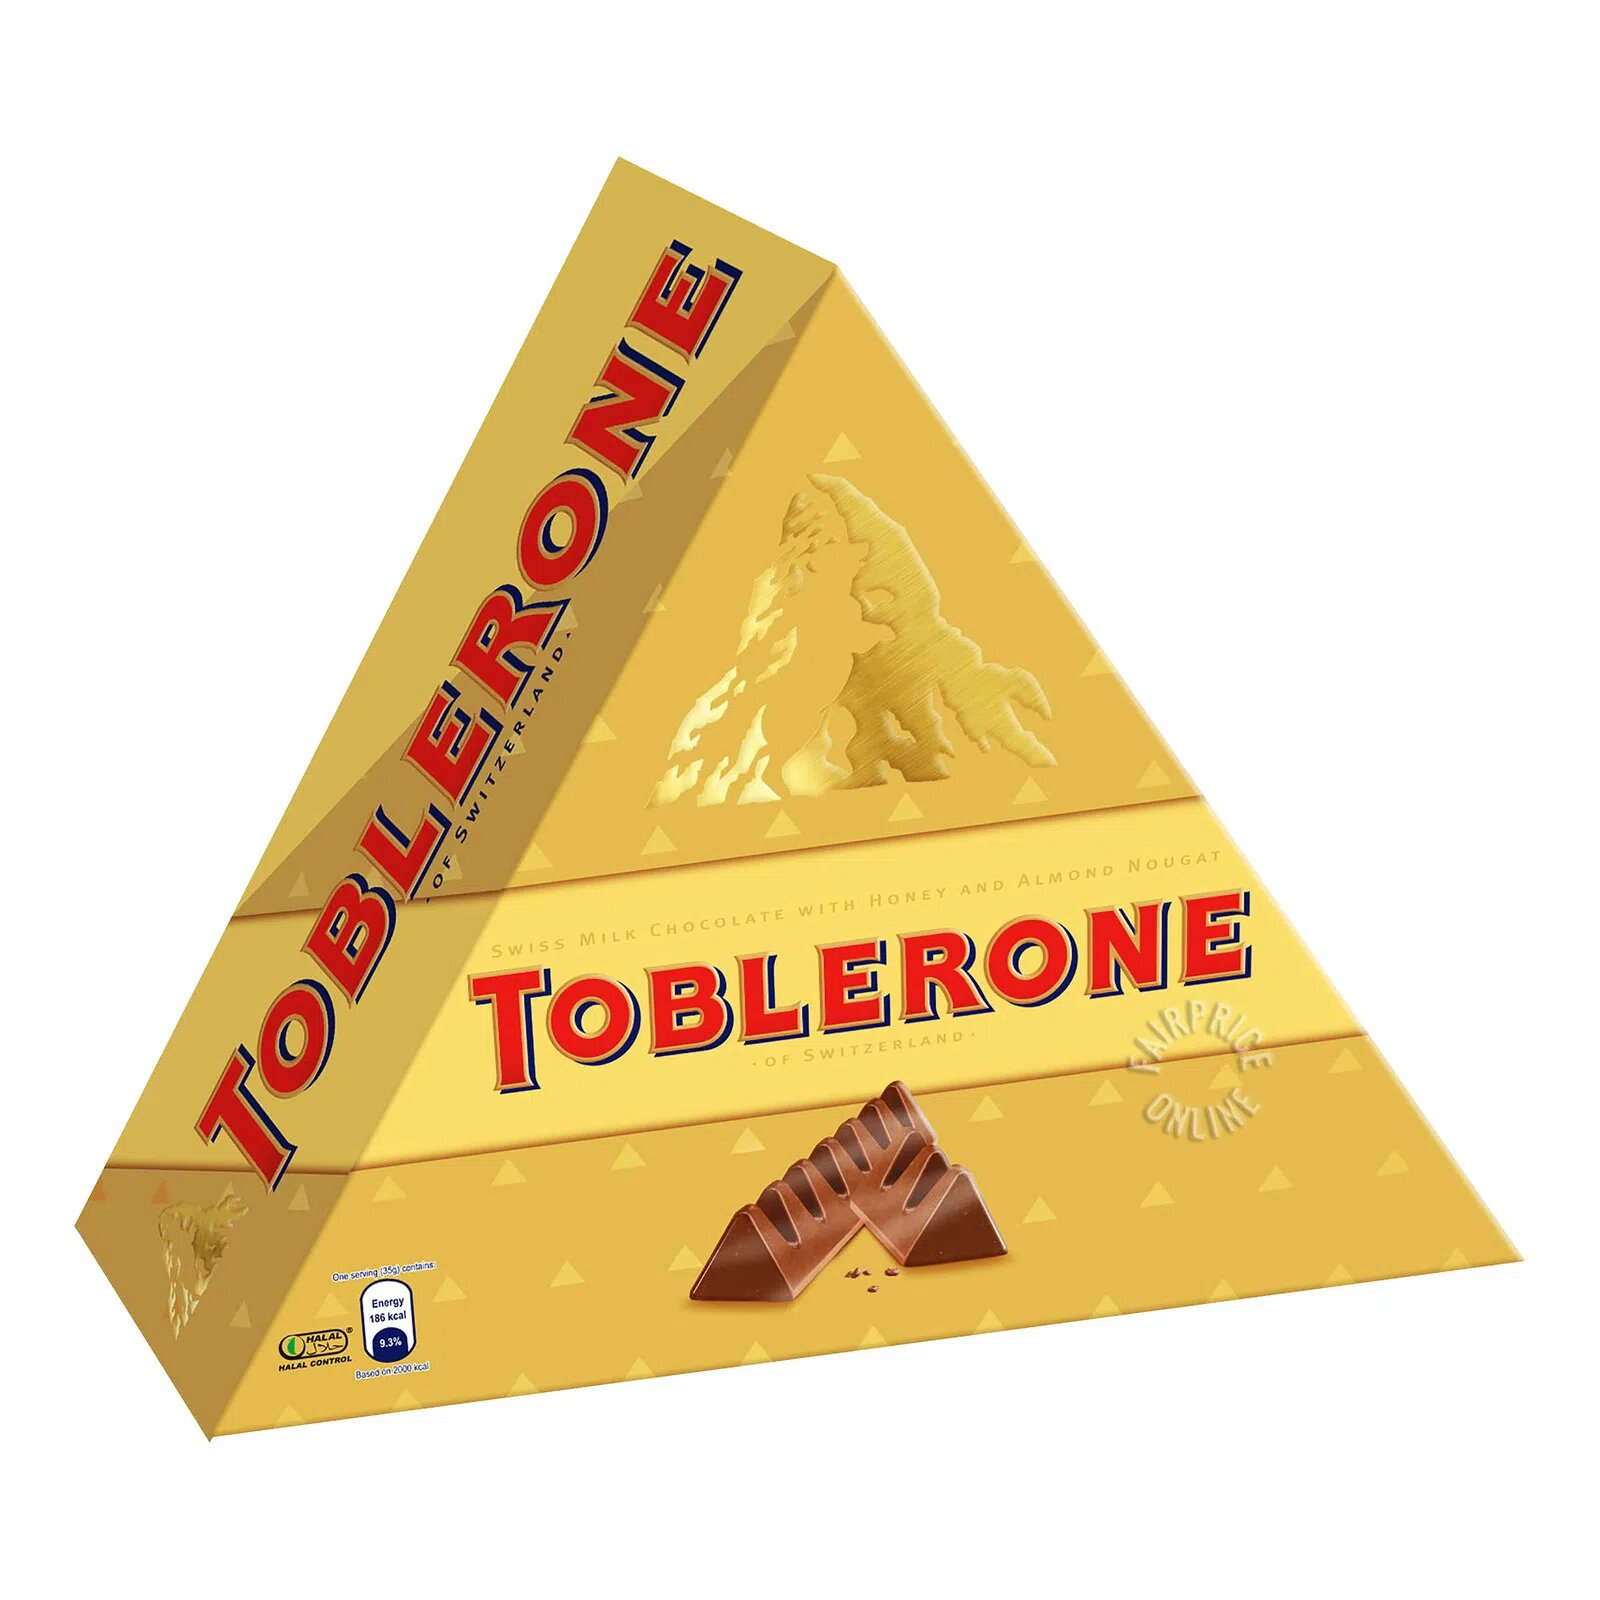 Toblerone Chocolate Bar - Milk (Pyramid)